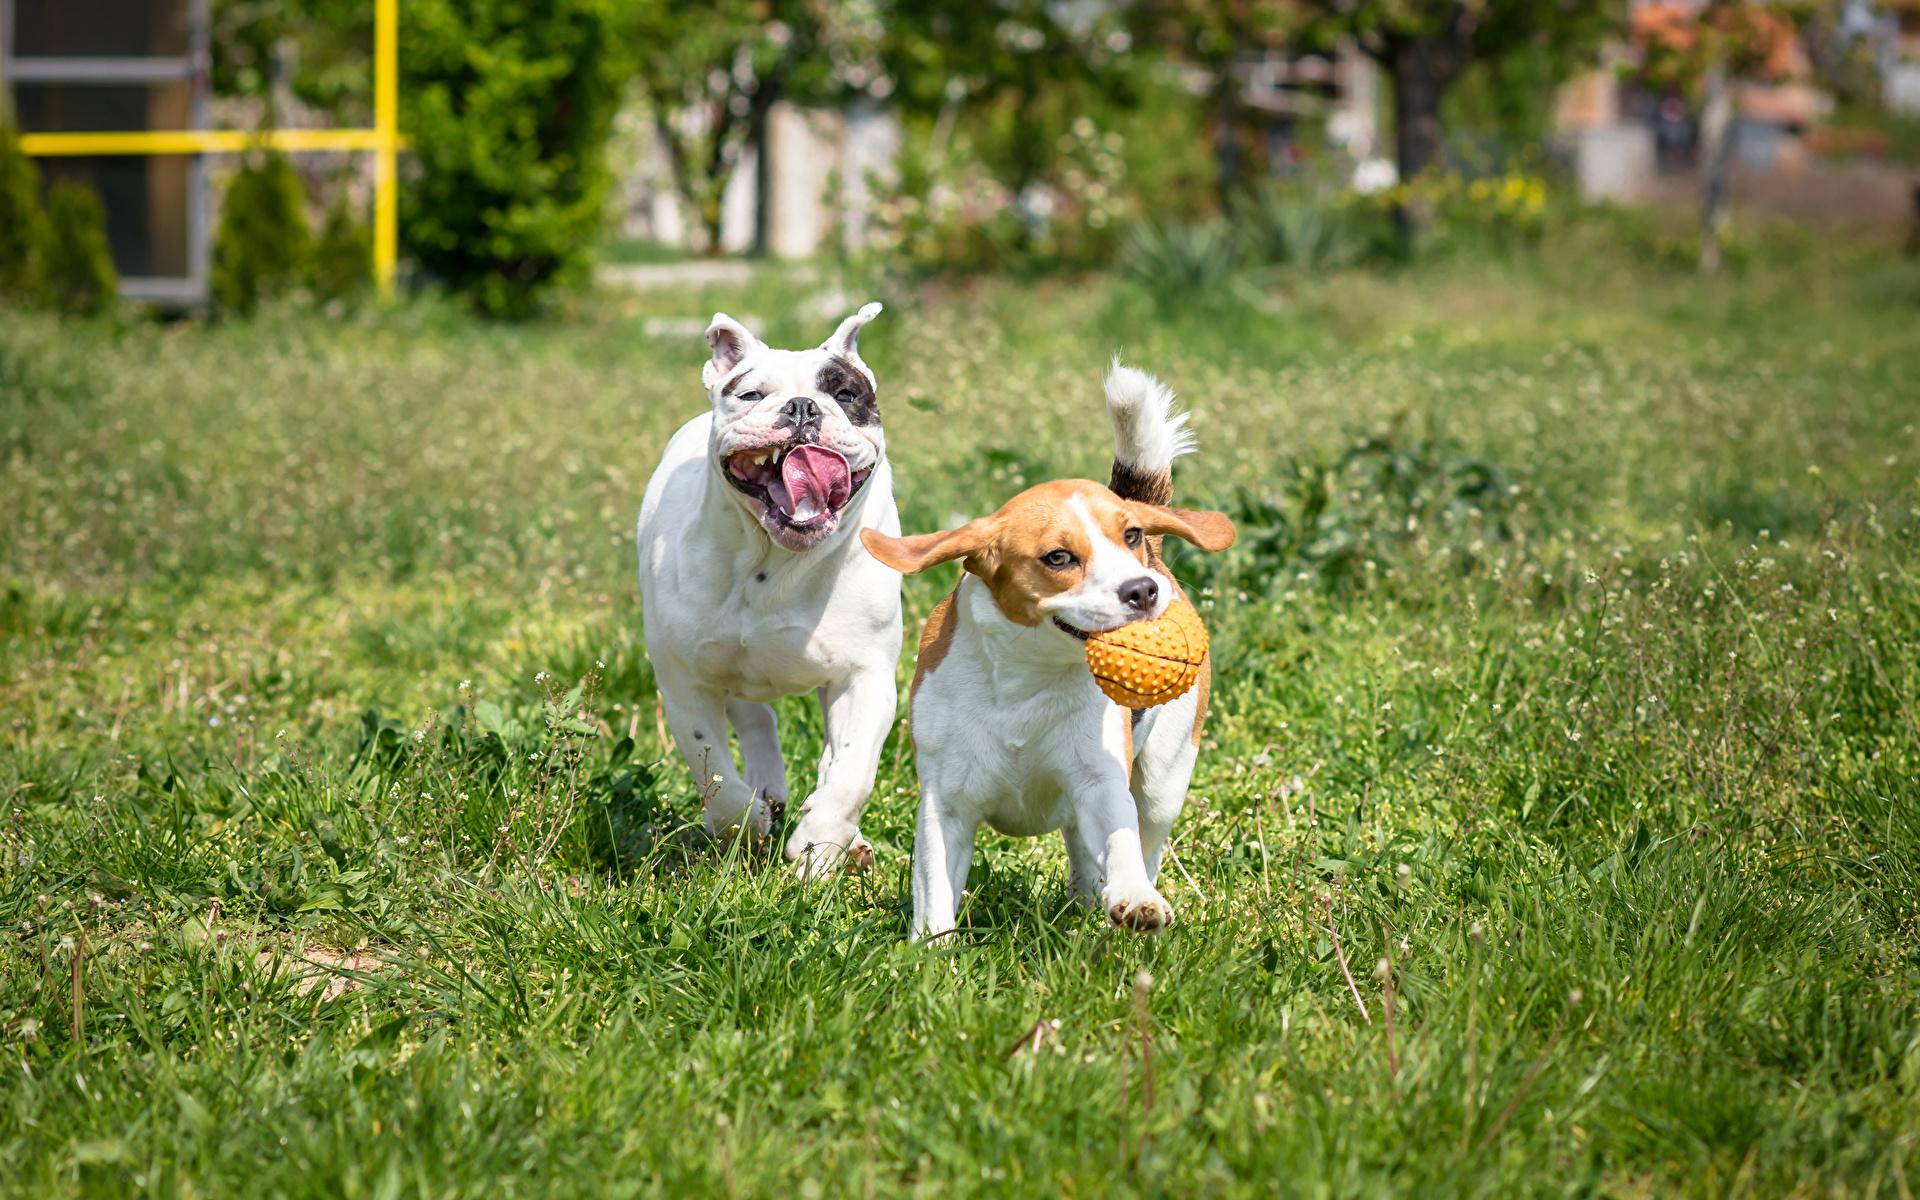 Images Beagle Bulldog Dogs Two Grass animal 1920x1200 dog 2 Animals